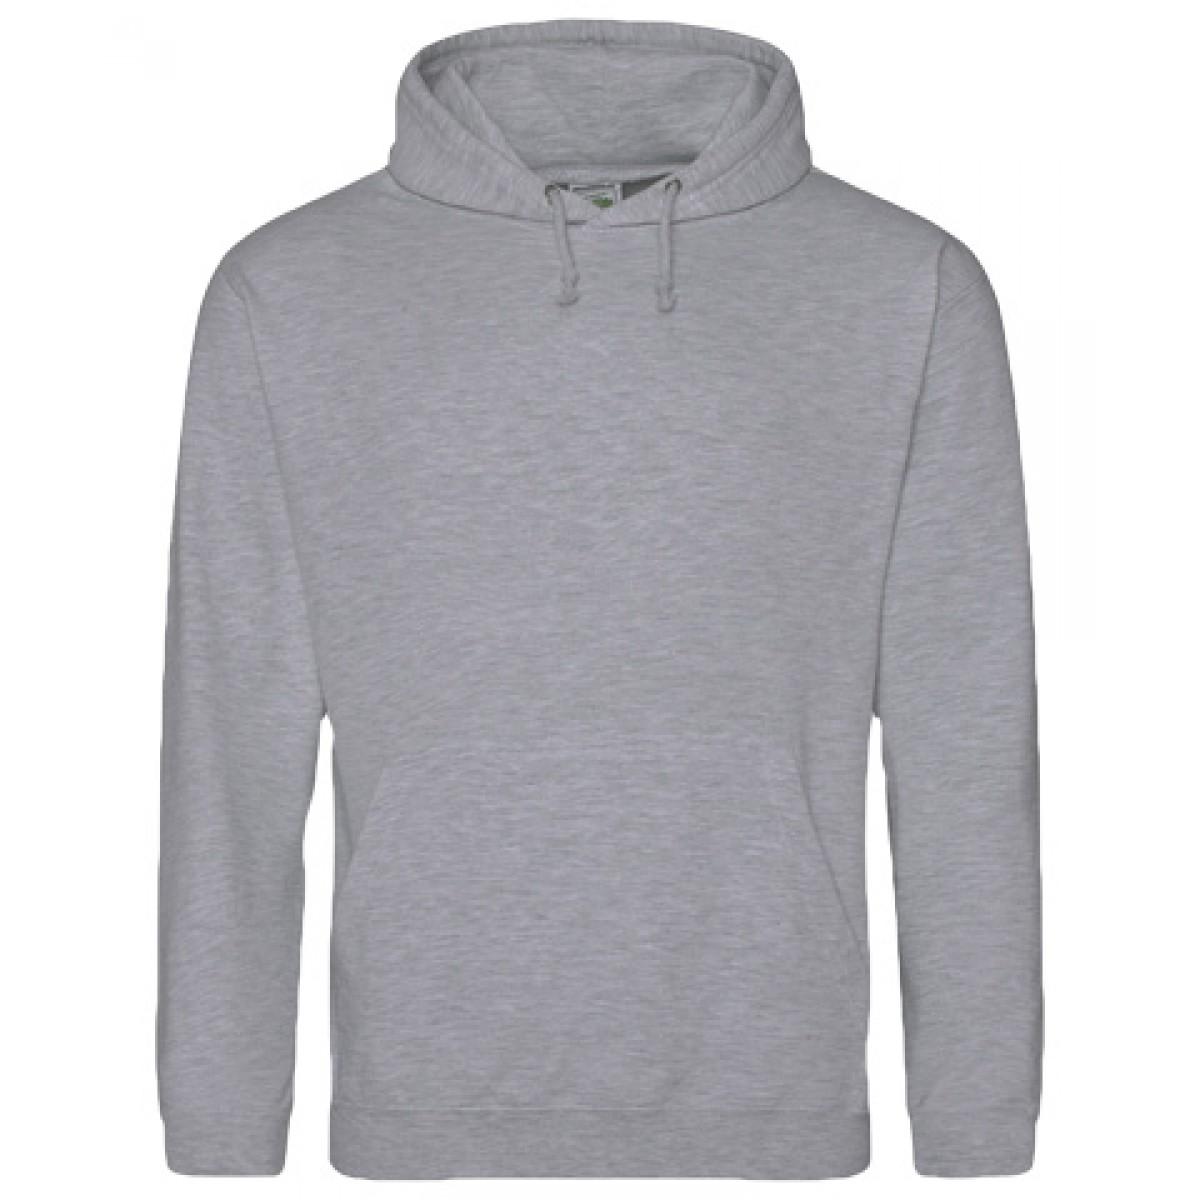 Hooded Sweatshirt 50/50 Heavy Blend-Gray-YM